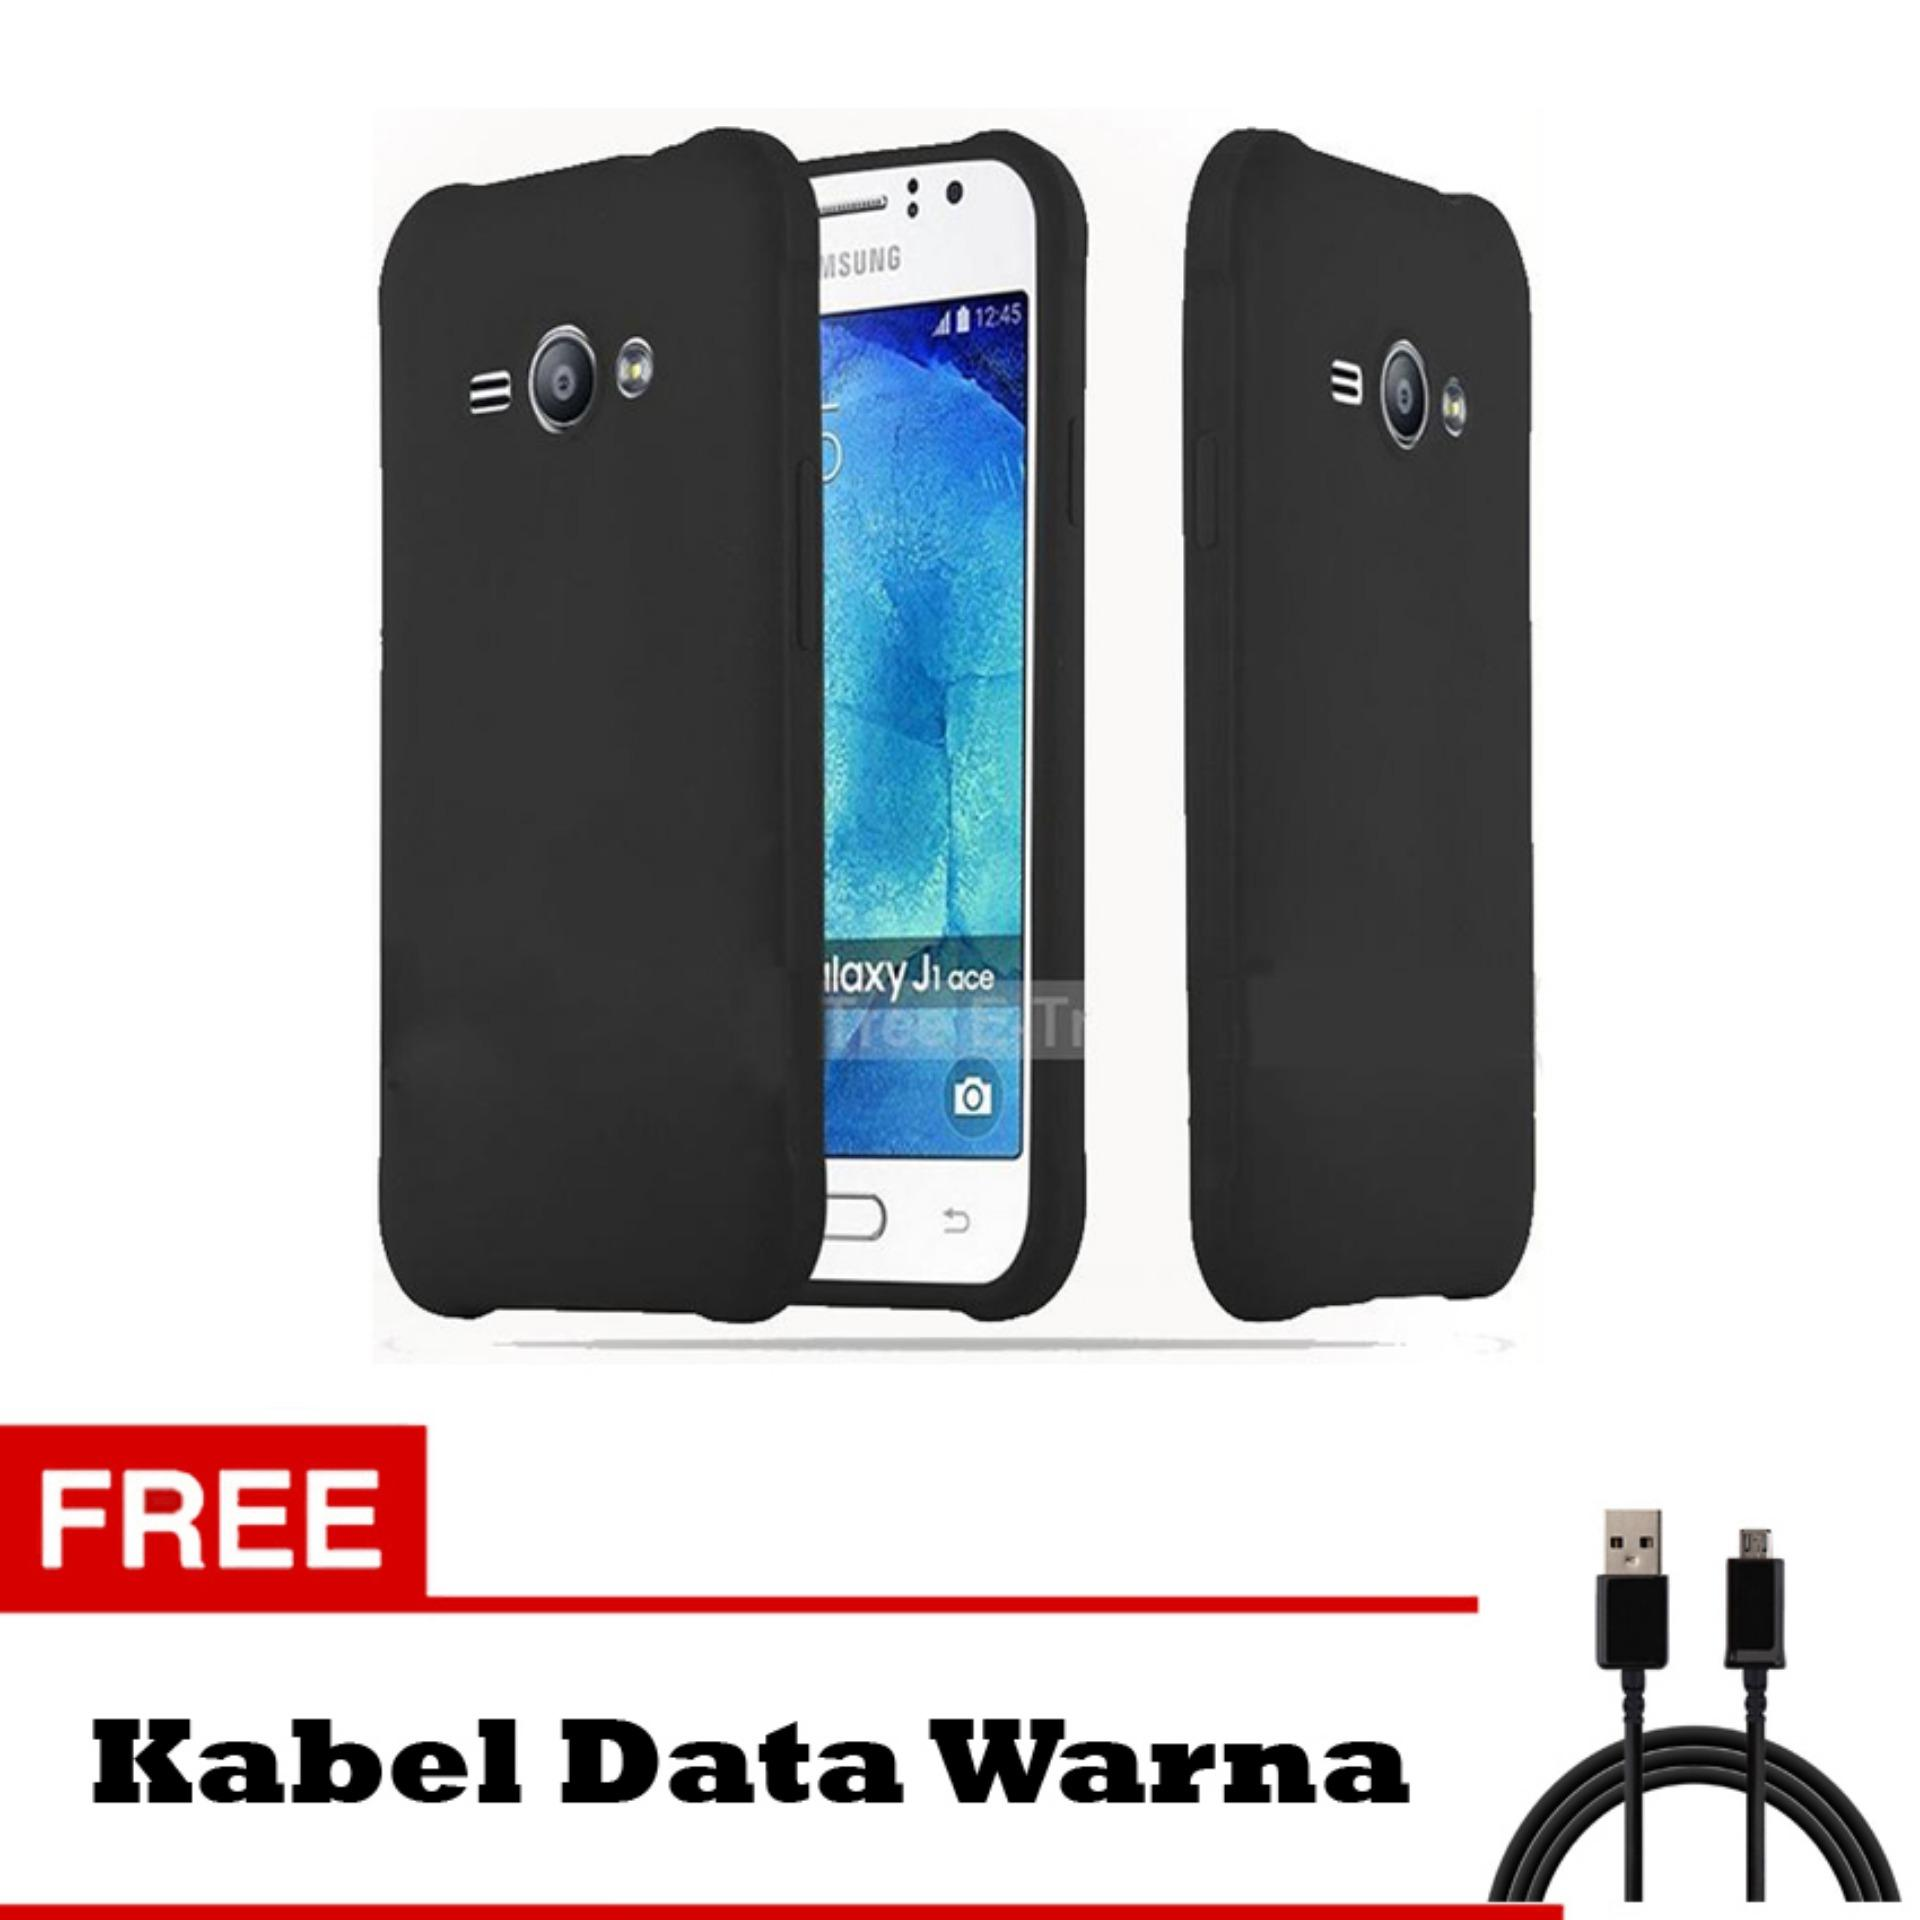 Cek Harga Baru Case Slim Black Matte Samsung Galaxy J1 Ace Baby Skin